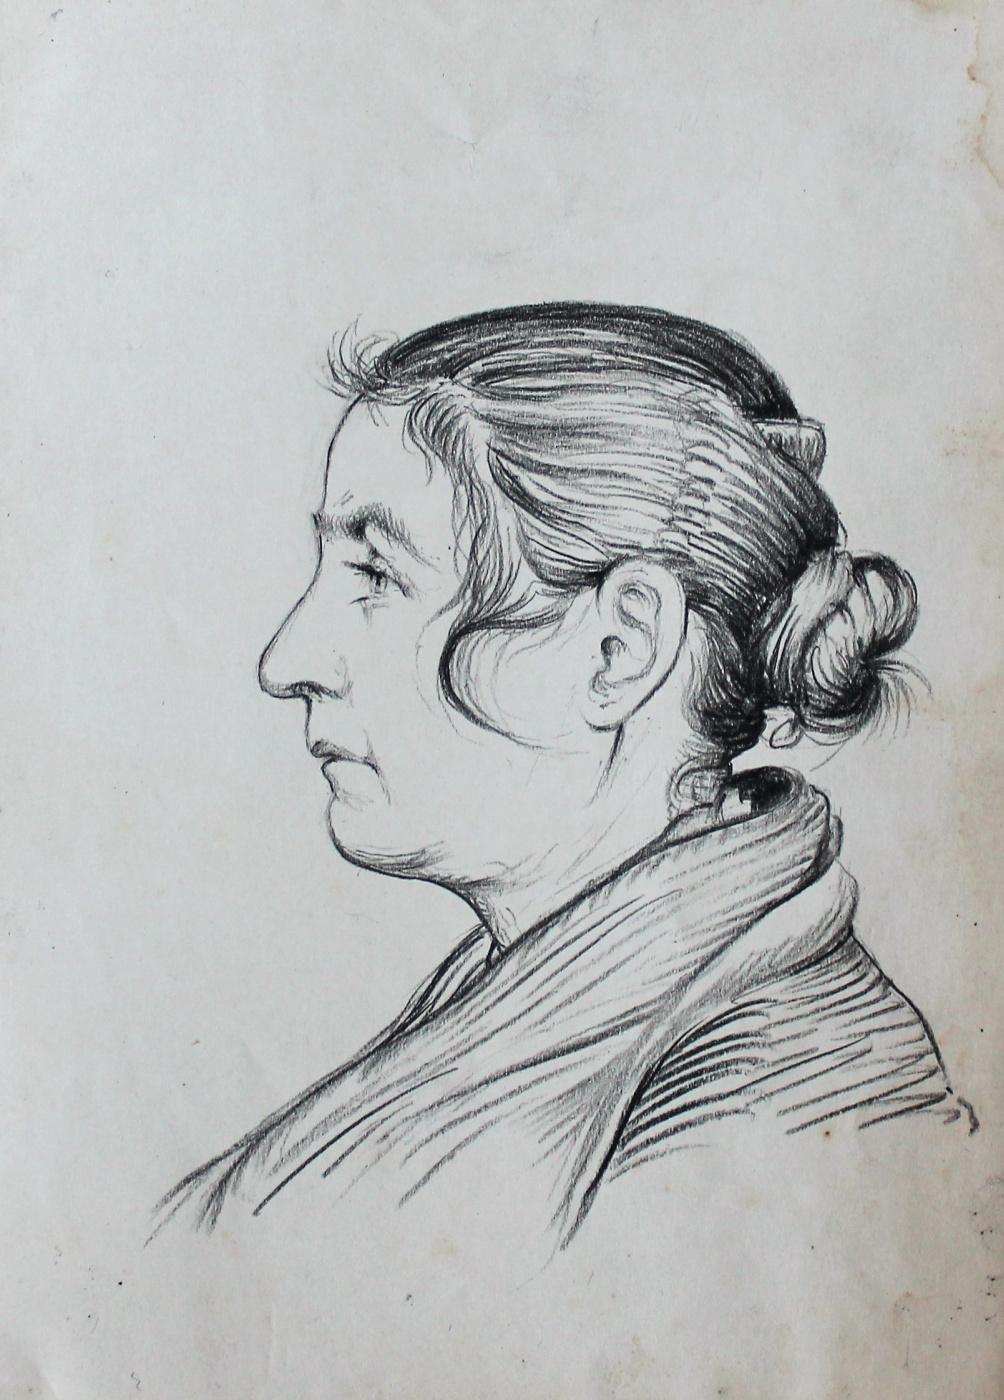 Nikolay Yakovlevich Talyantsev. Maria Shonkina